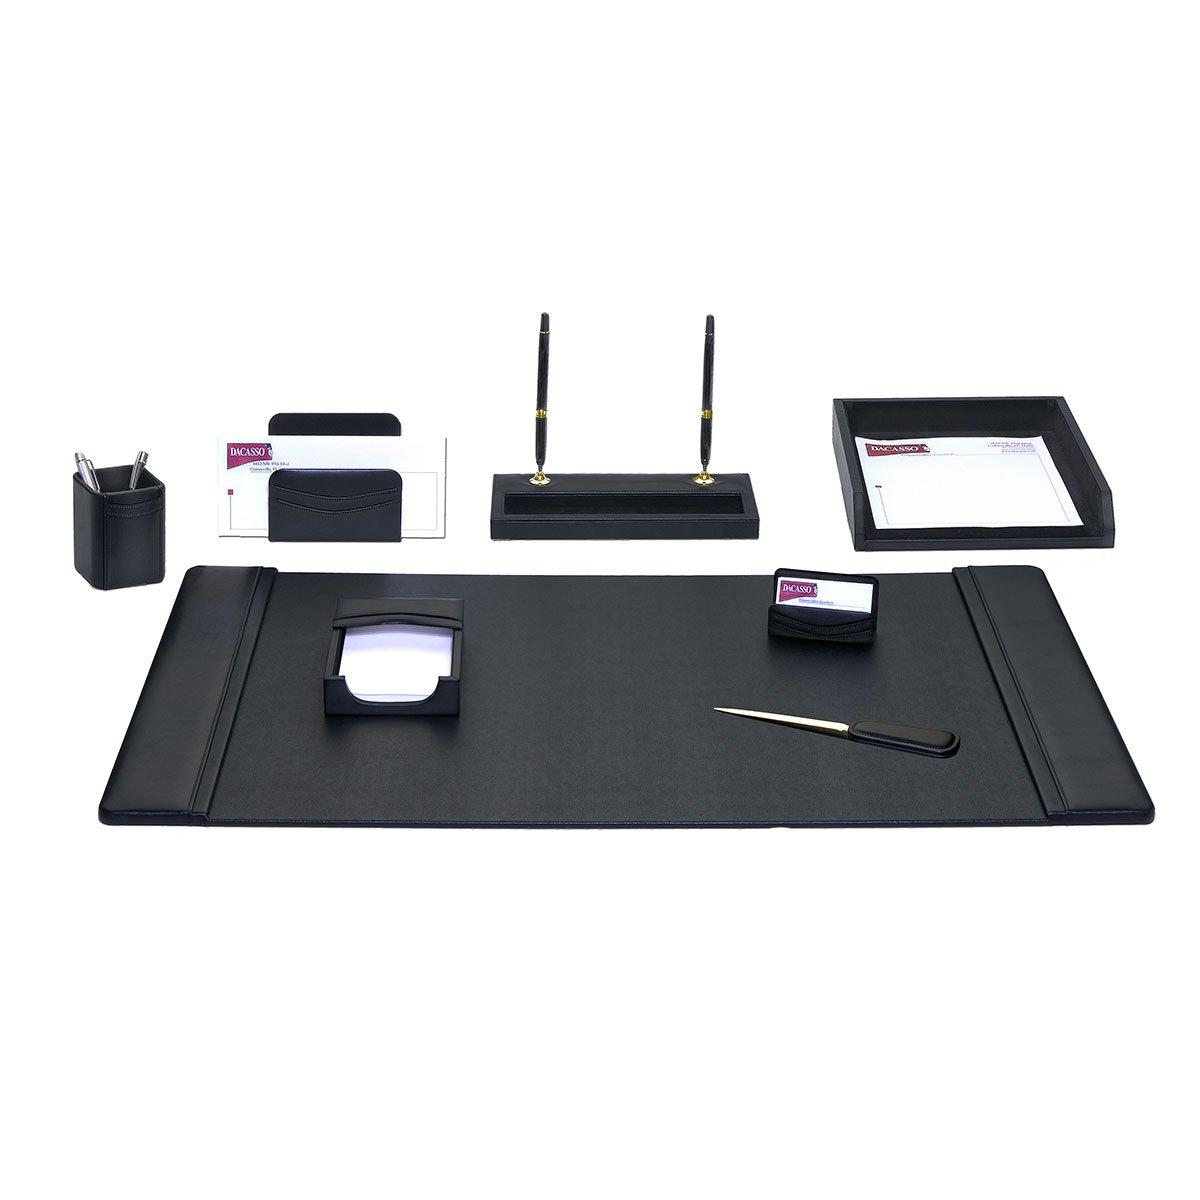 Dacasso Leather Desk Set, 8-Piece, Black by Dacasso (Image #1)